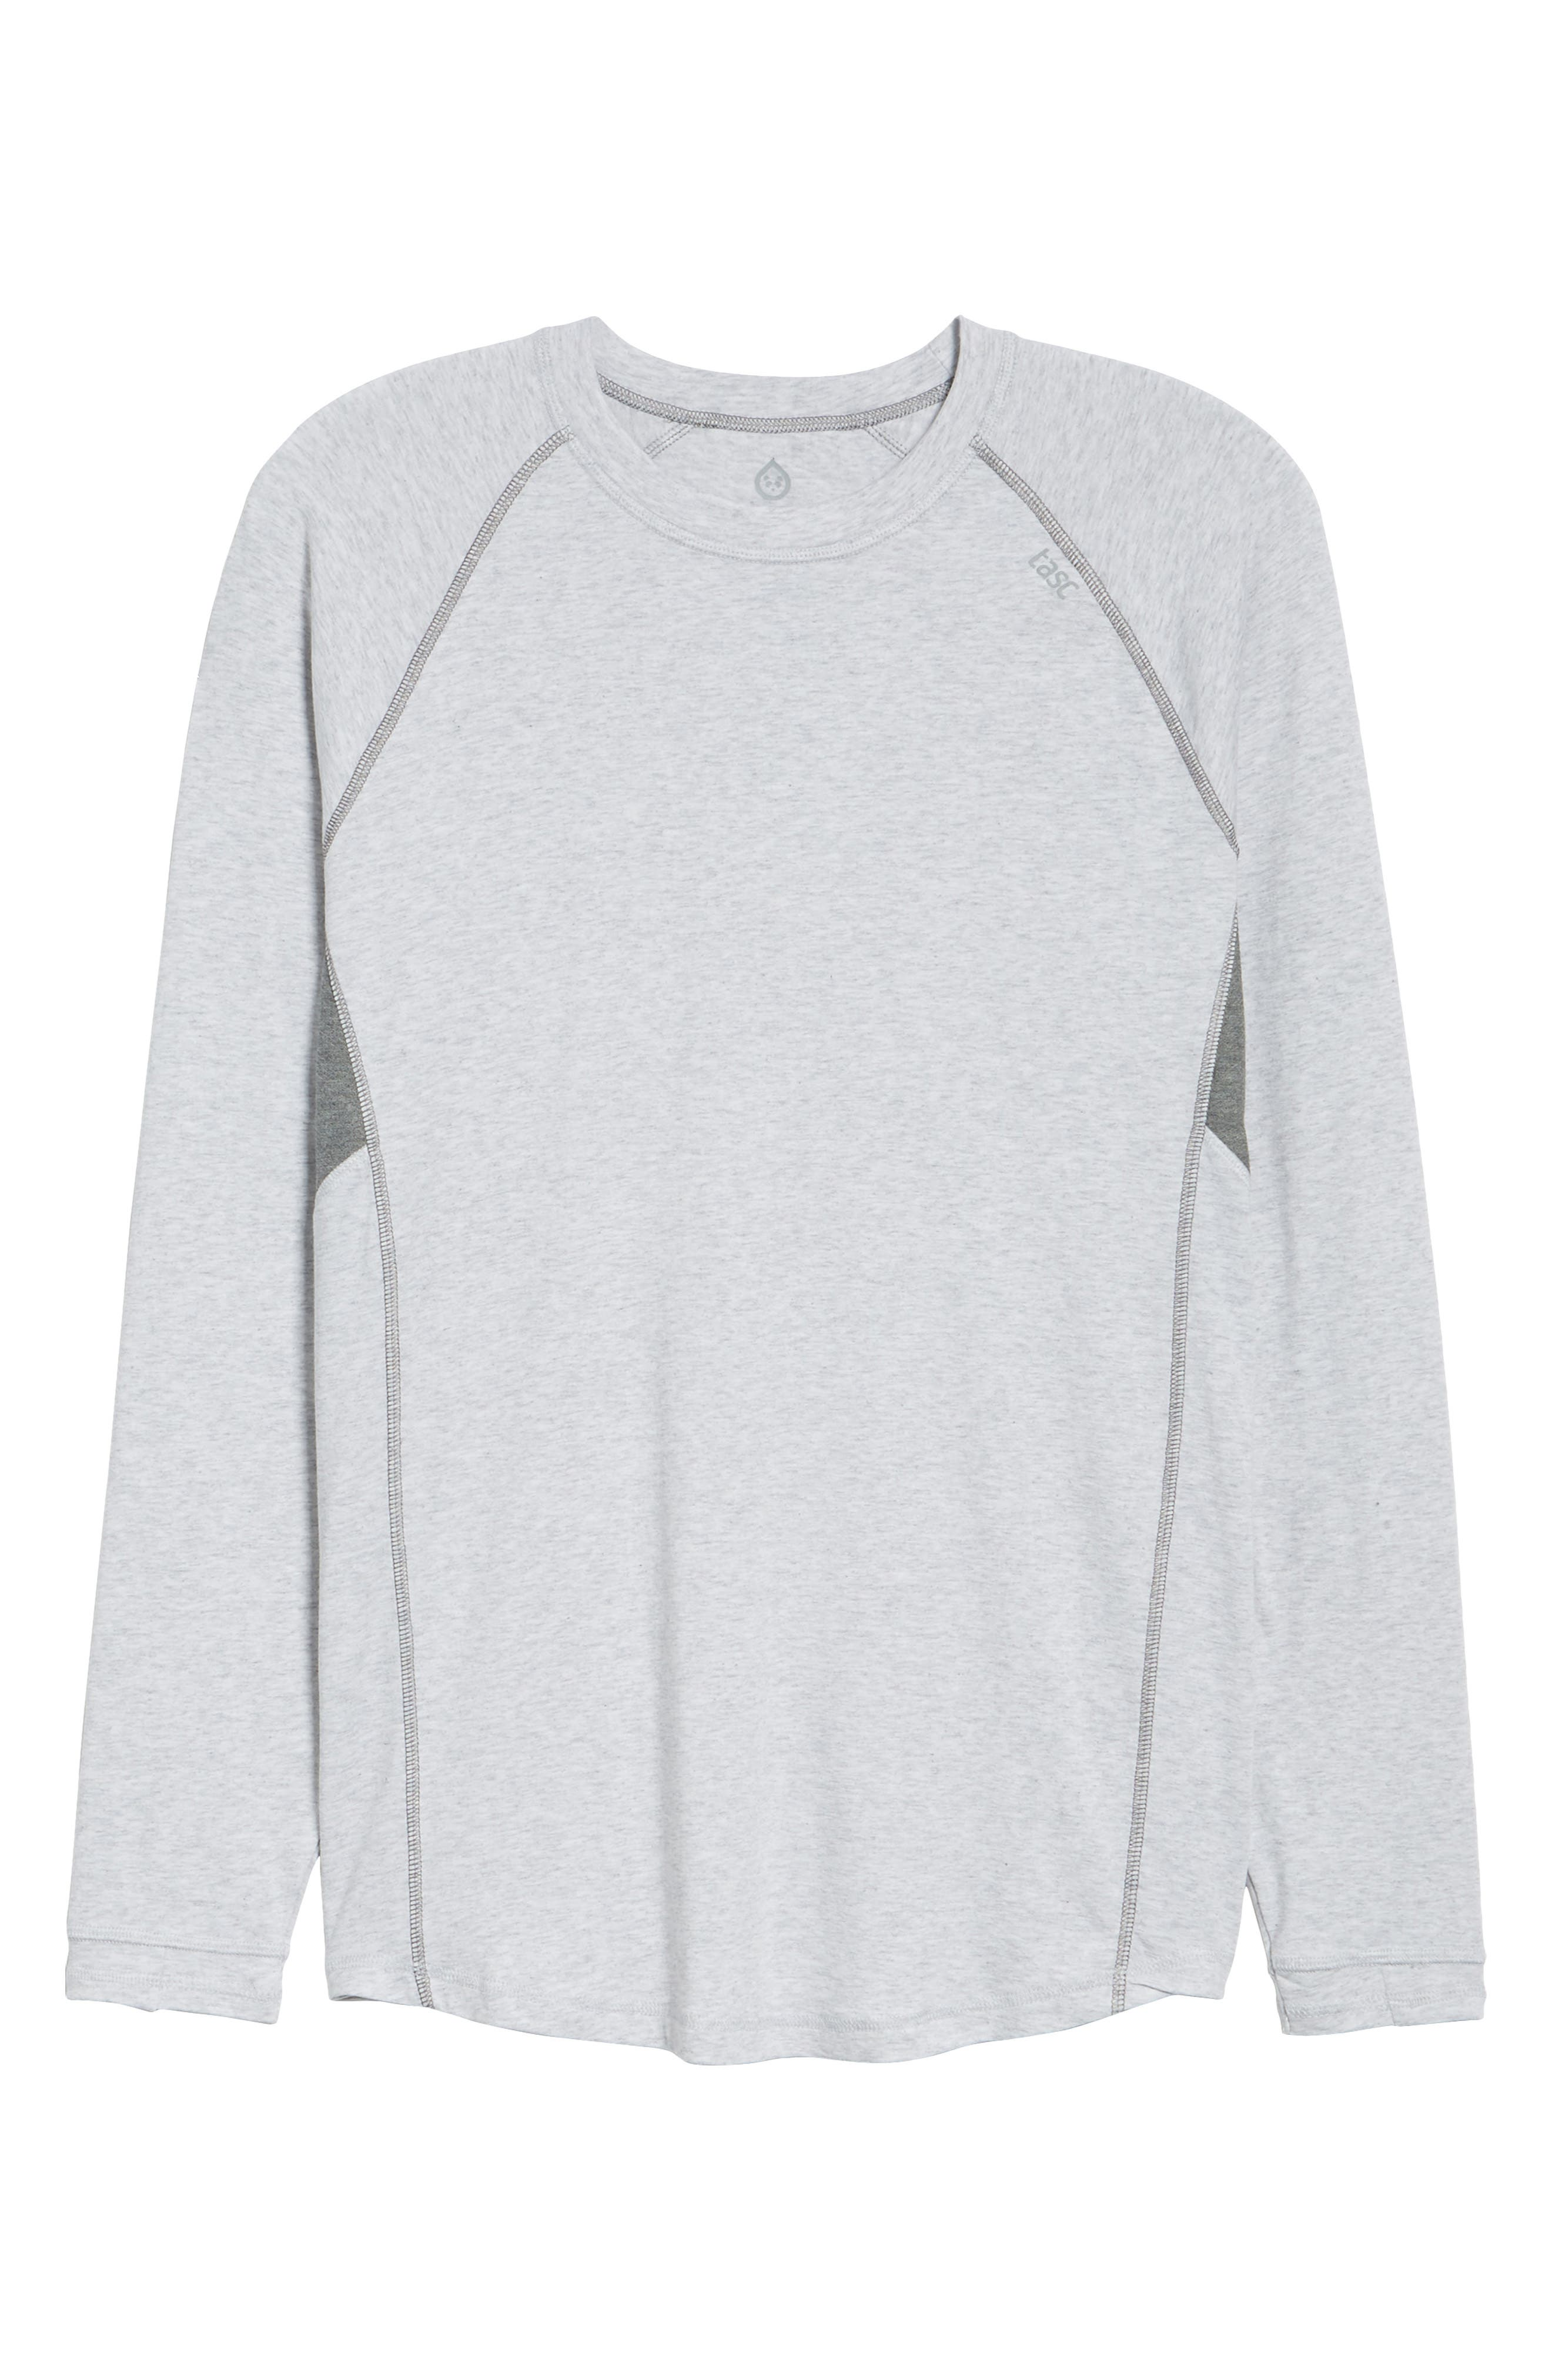 Charge II Long Sleeve Shirt,                             Alternate thumbnail 6, color,                             Light Heather Gray